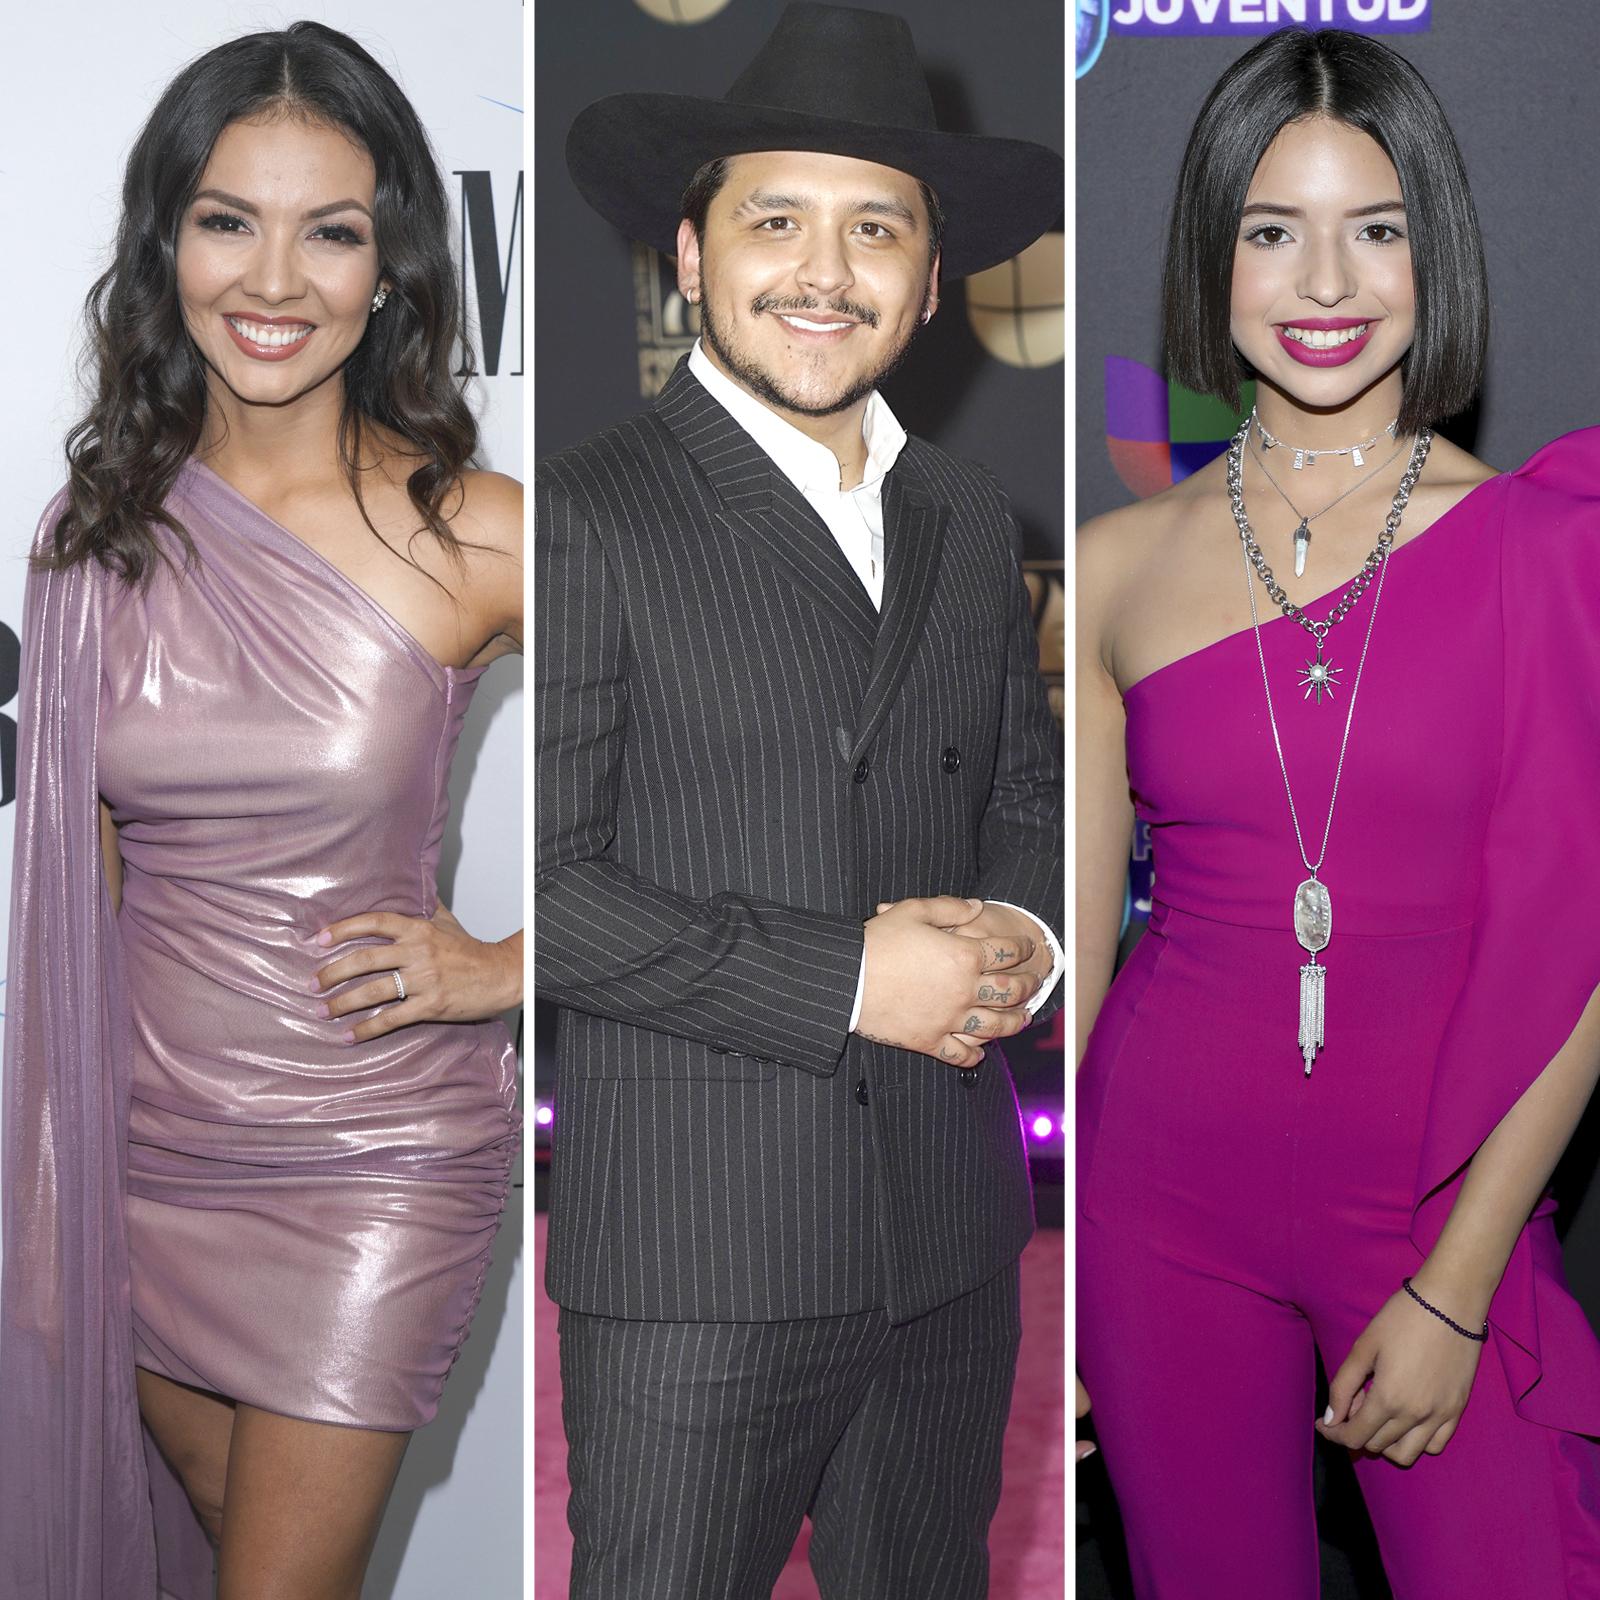 Lupita Infante, Christian Nodal and Angela Aguilar